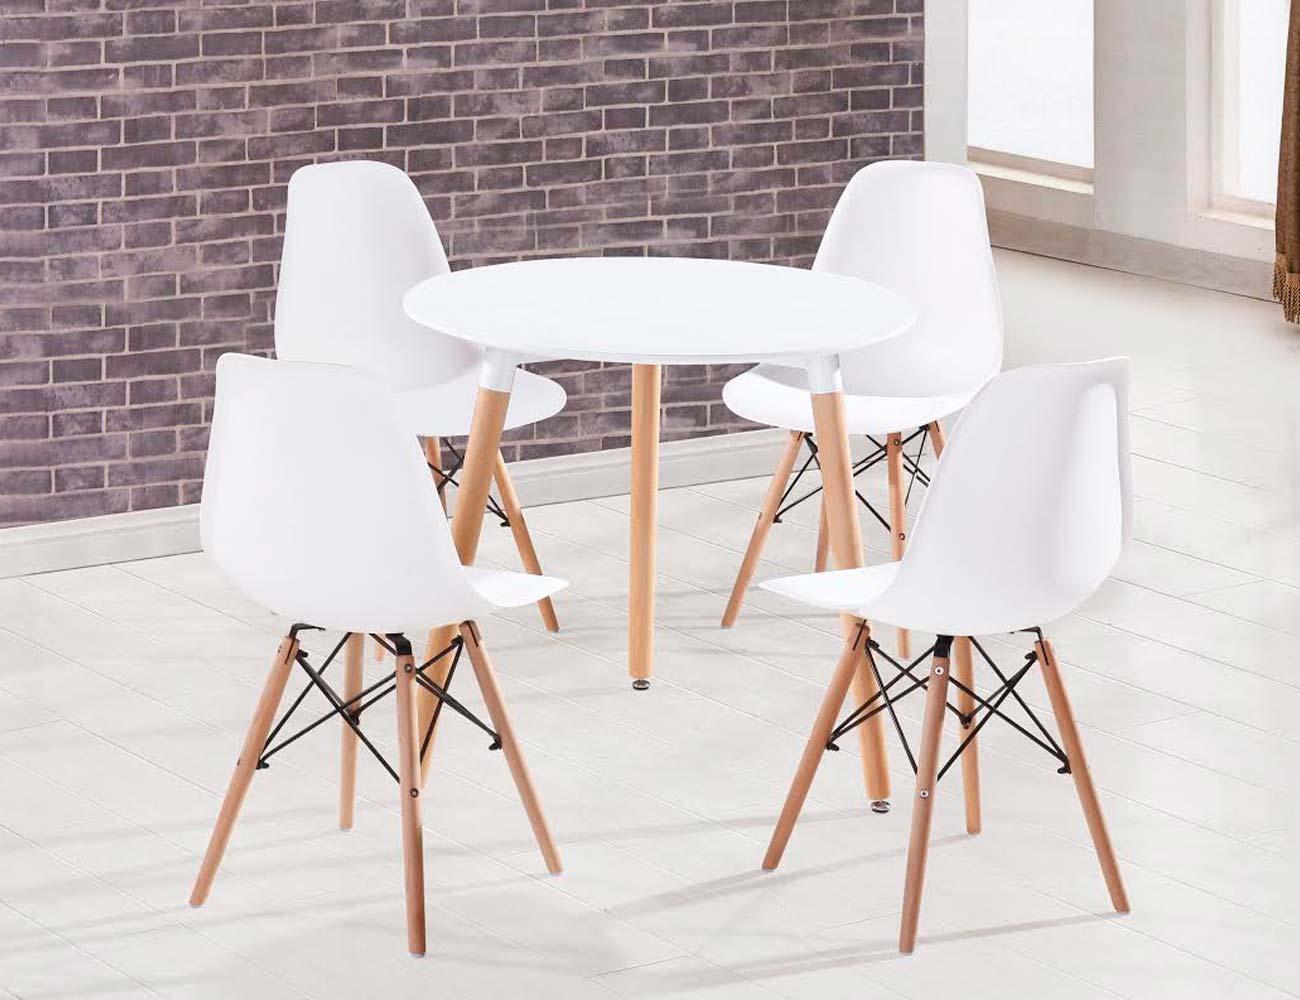 Foto detalle silla asiento resina blanco patas madera 2